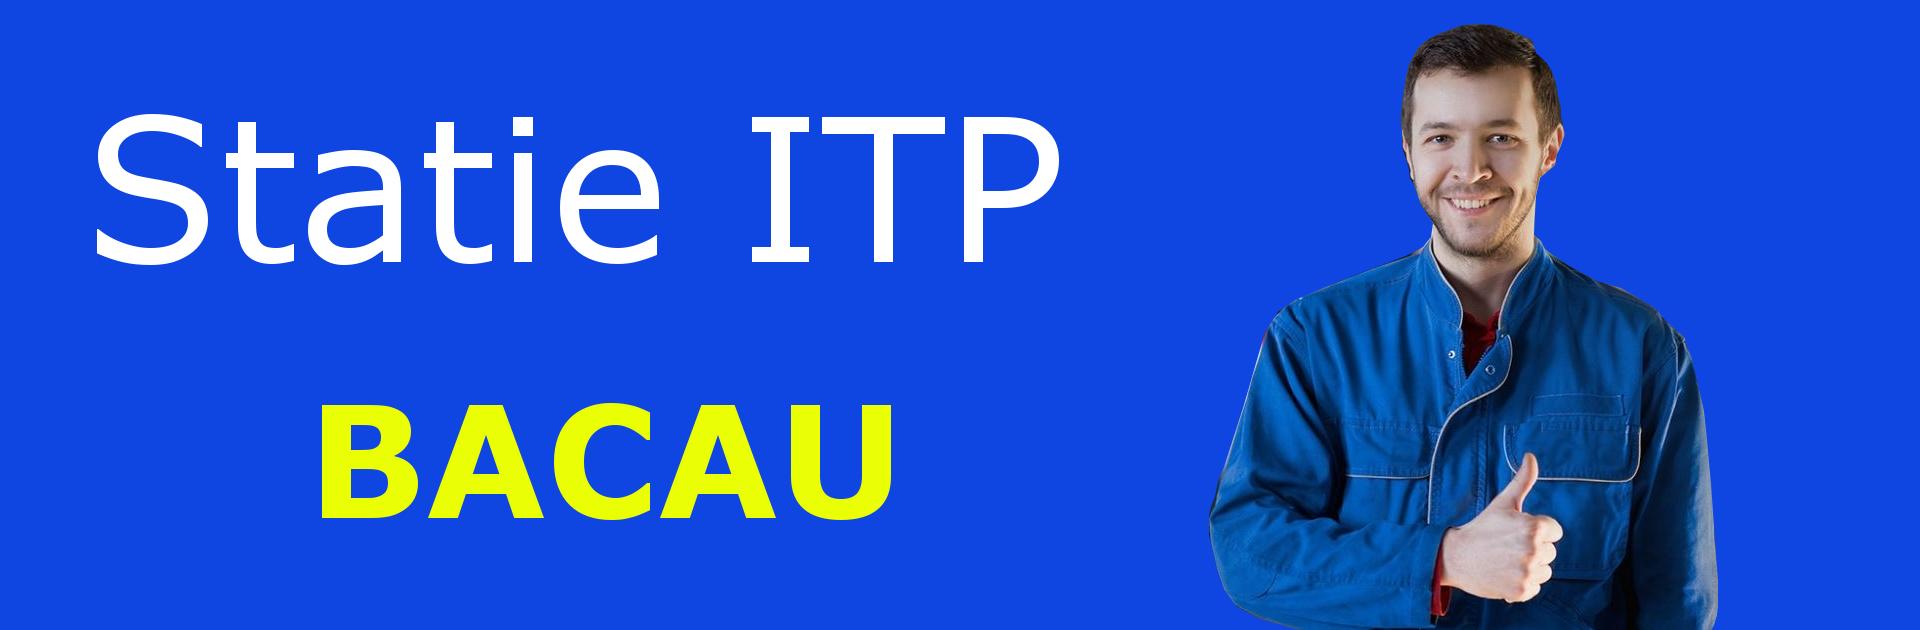 Banner ITP BACAU